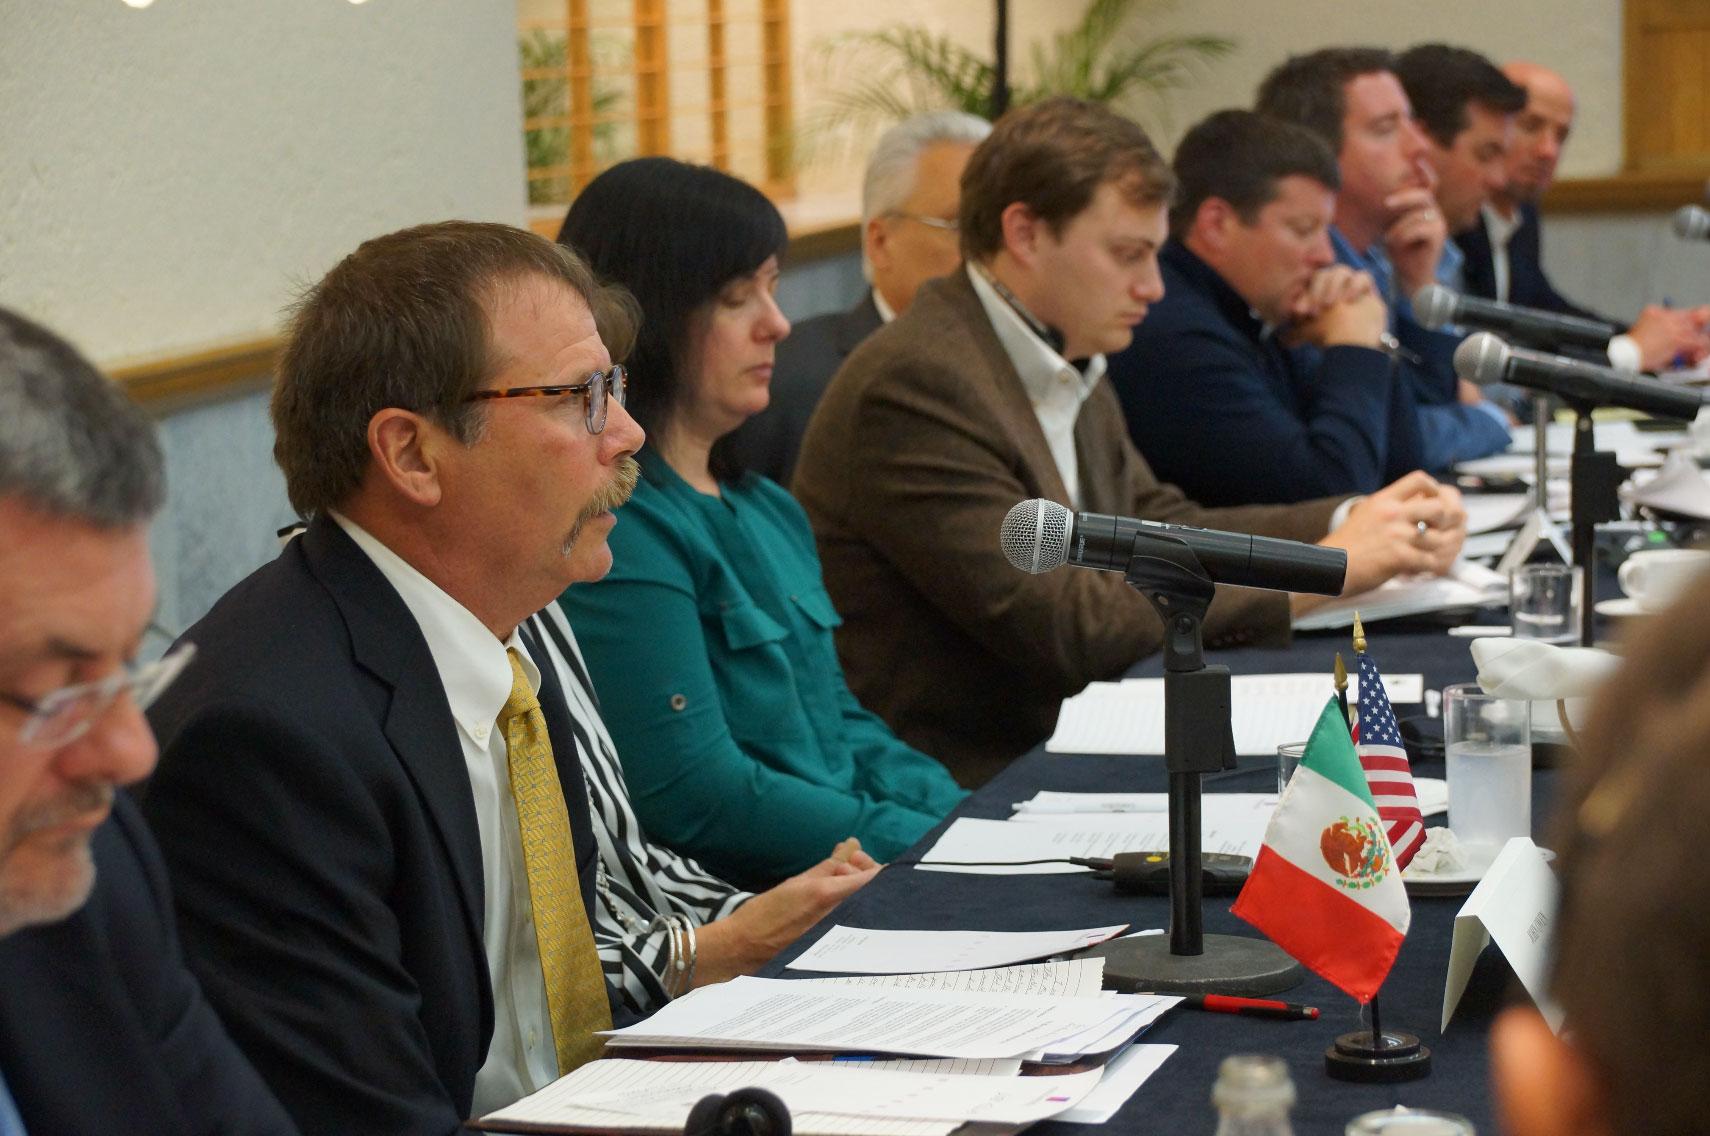 ITP.w-USA-Rice,-MX-Rice-Council-Mtg,-NAFTA-statement-170427